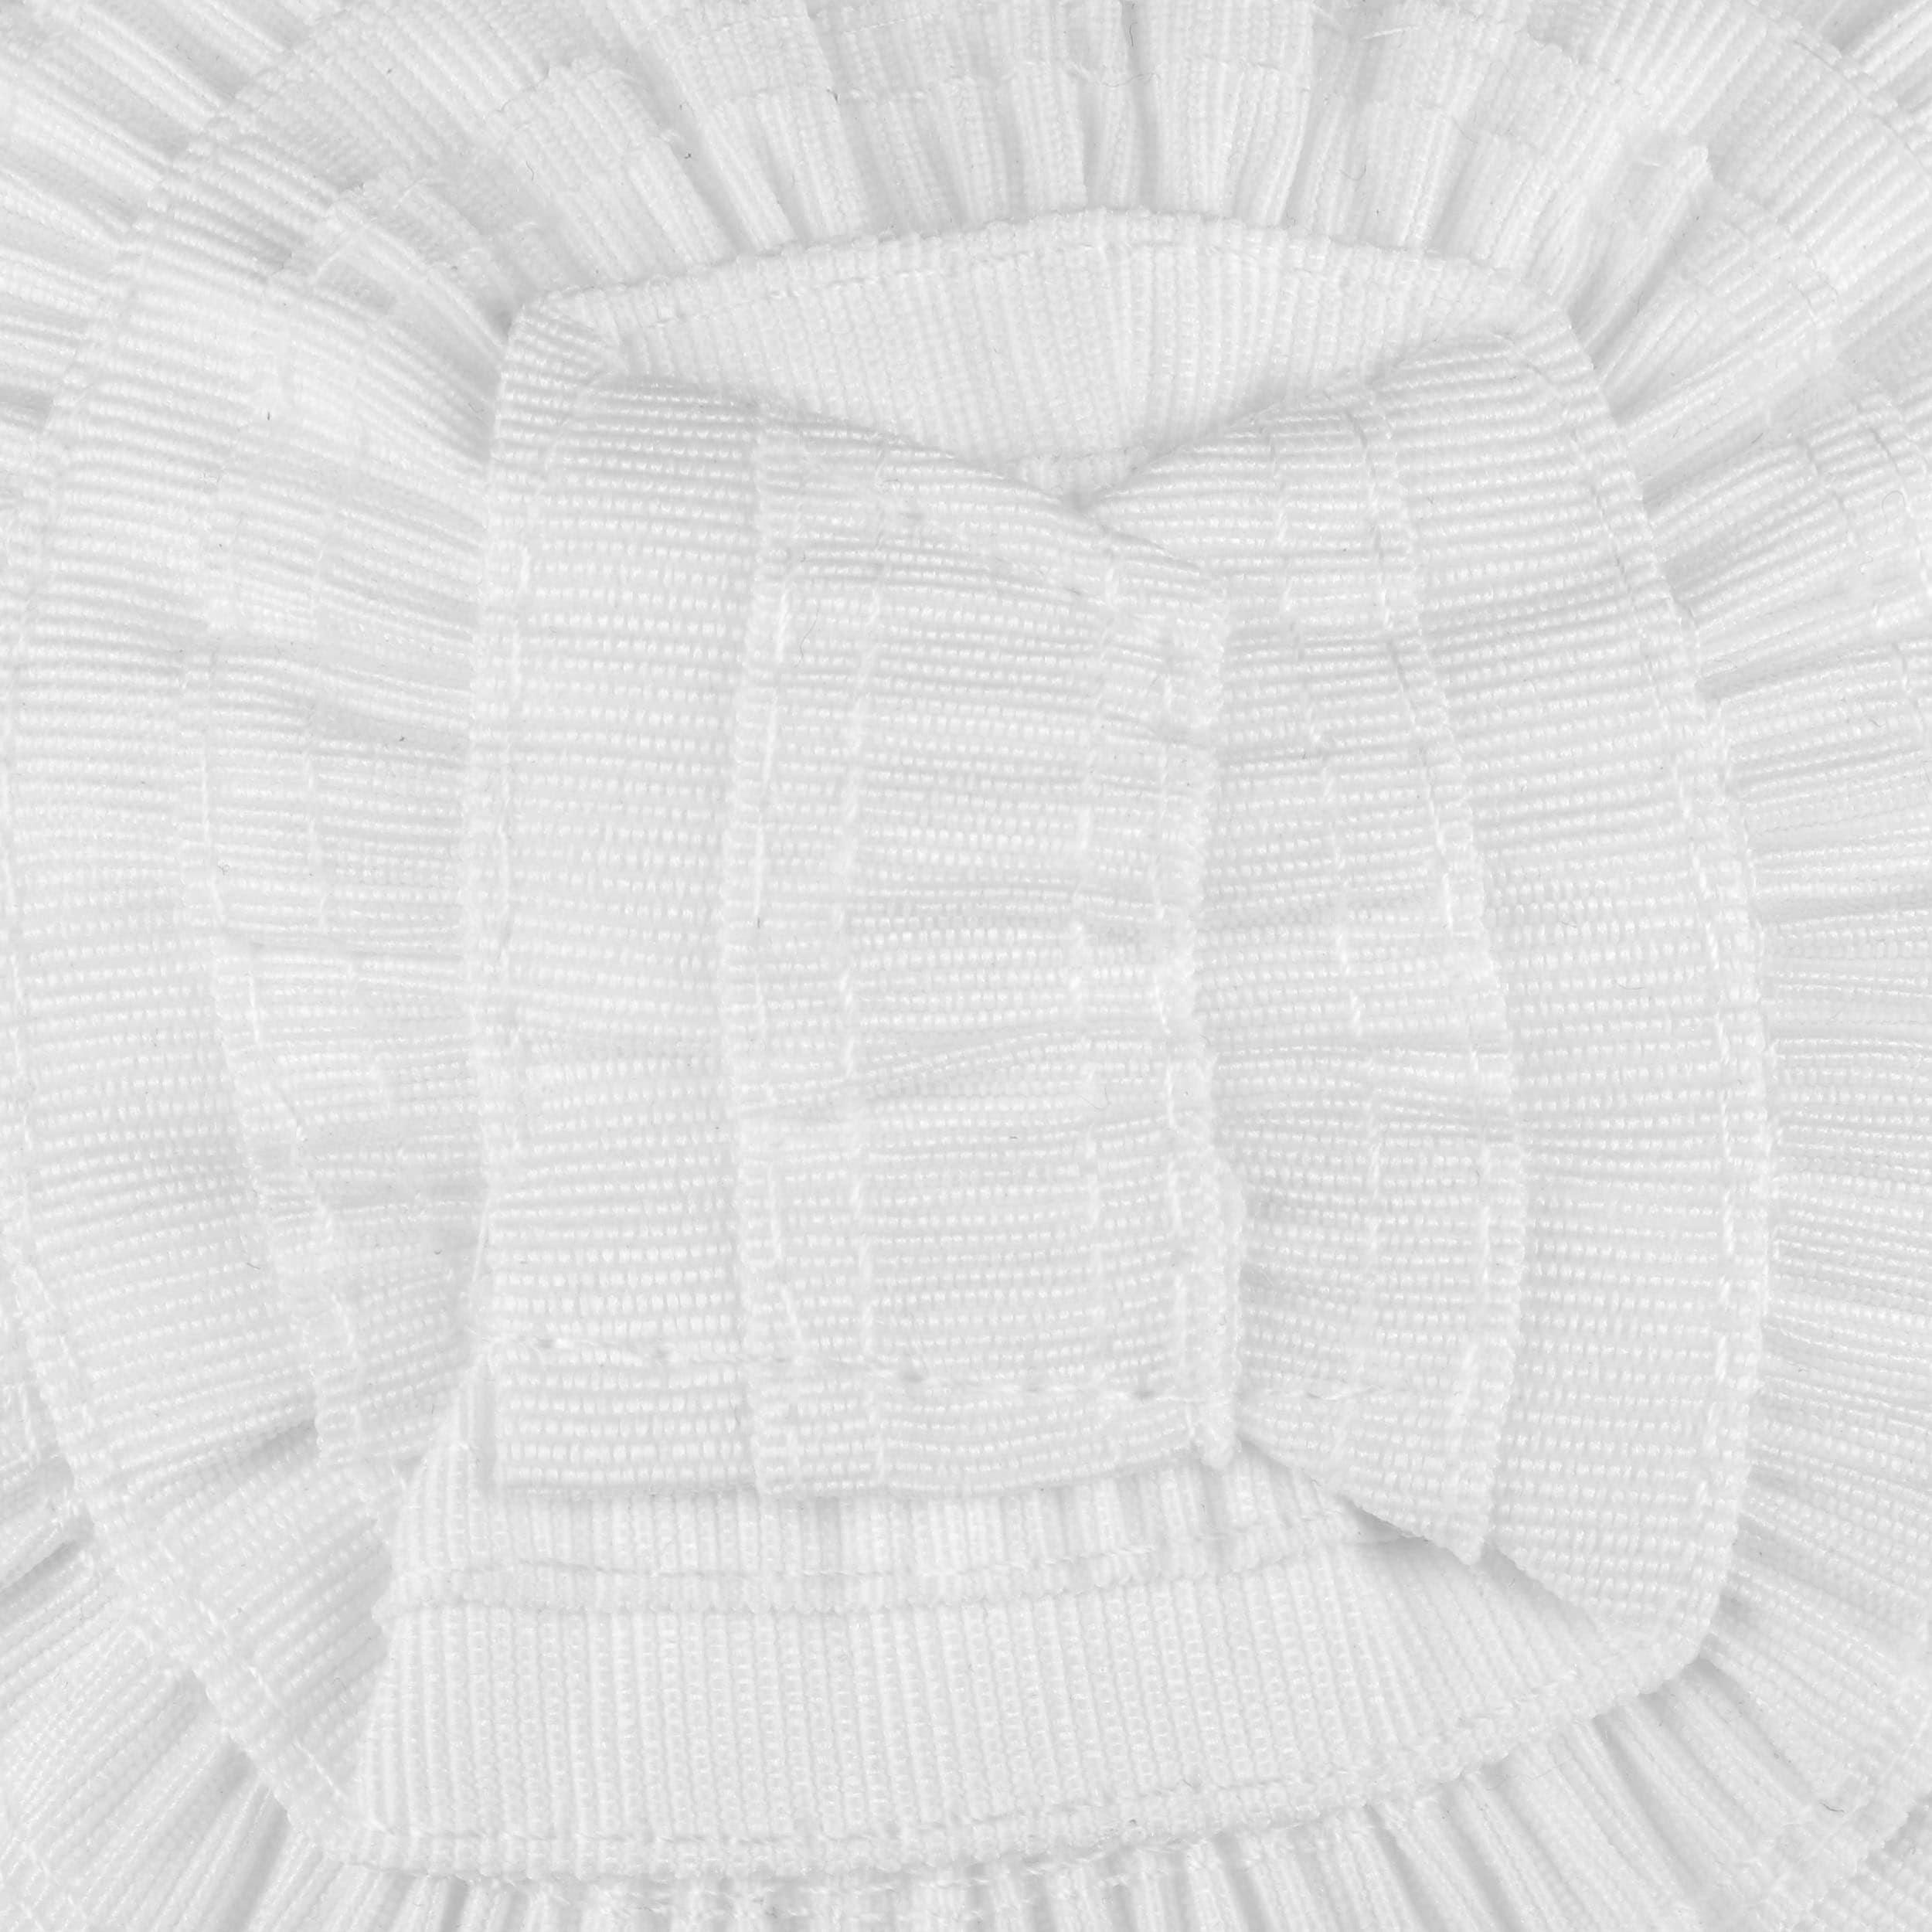 40747d4fbd4 ... Classic Sunshade Hut by Betmar - weiß 4 ...